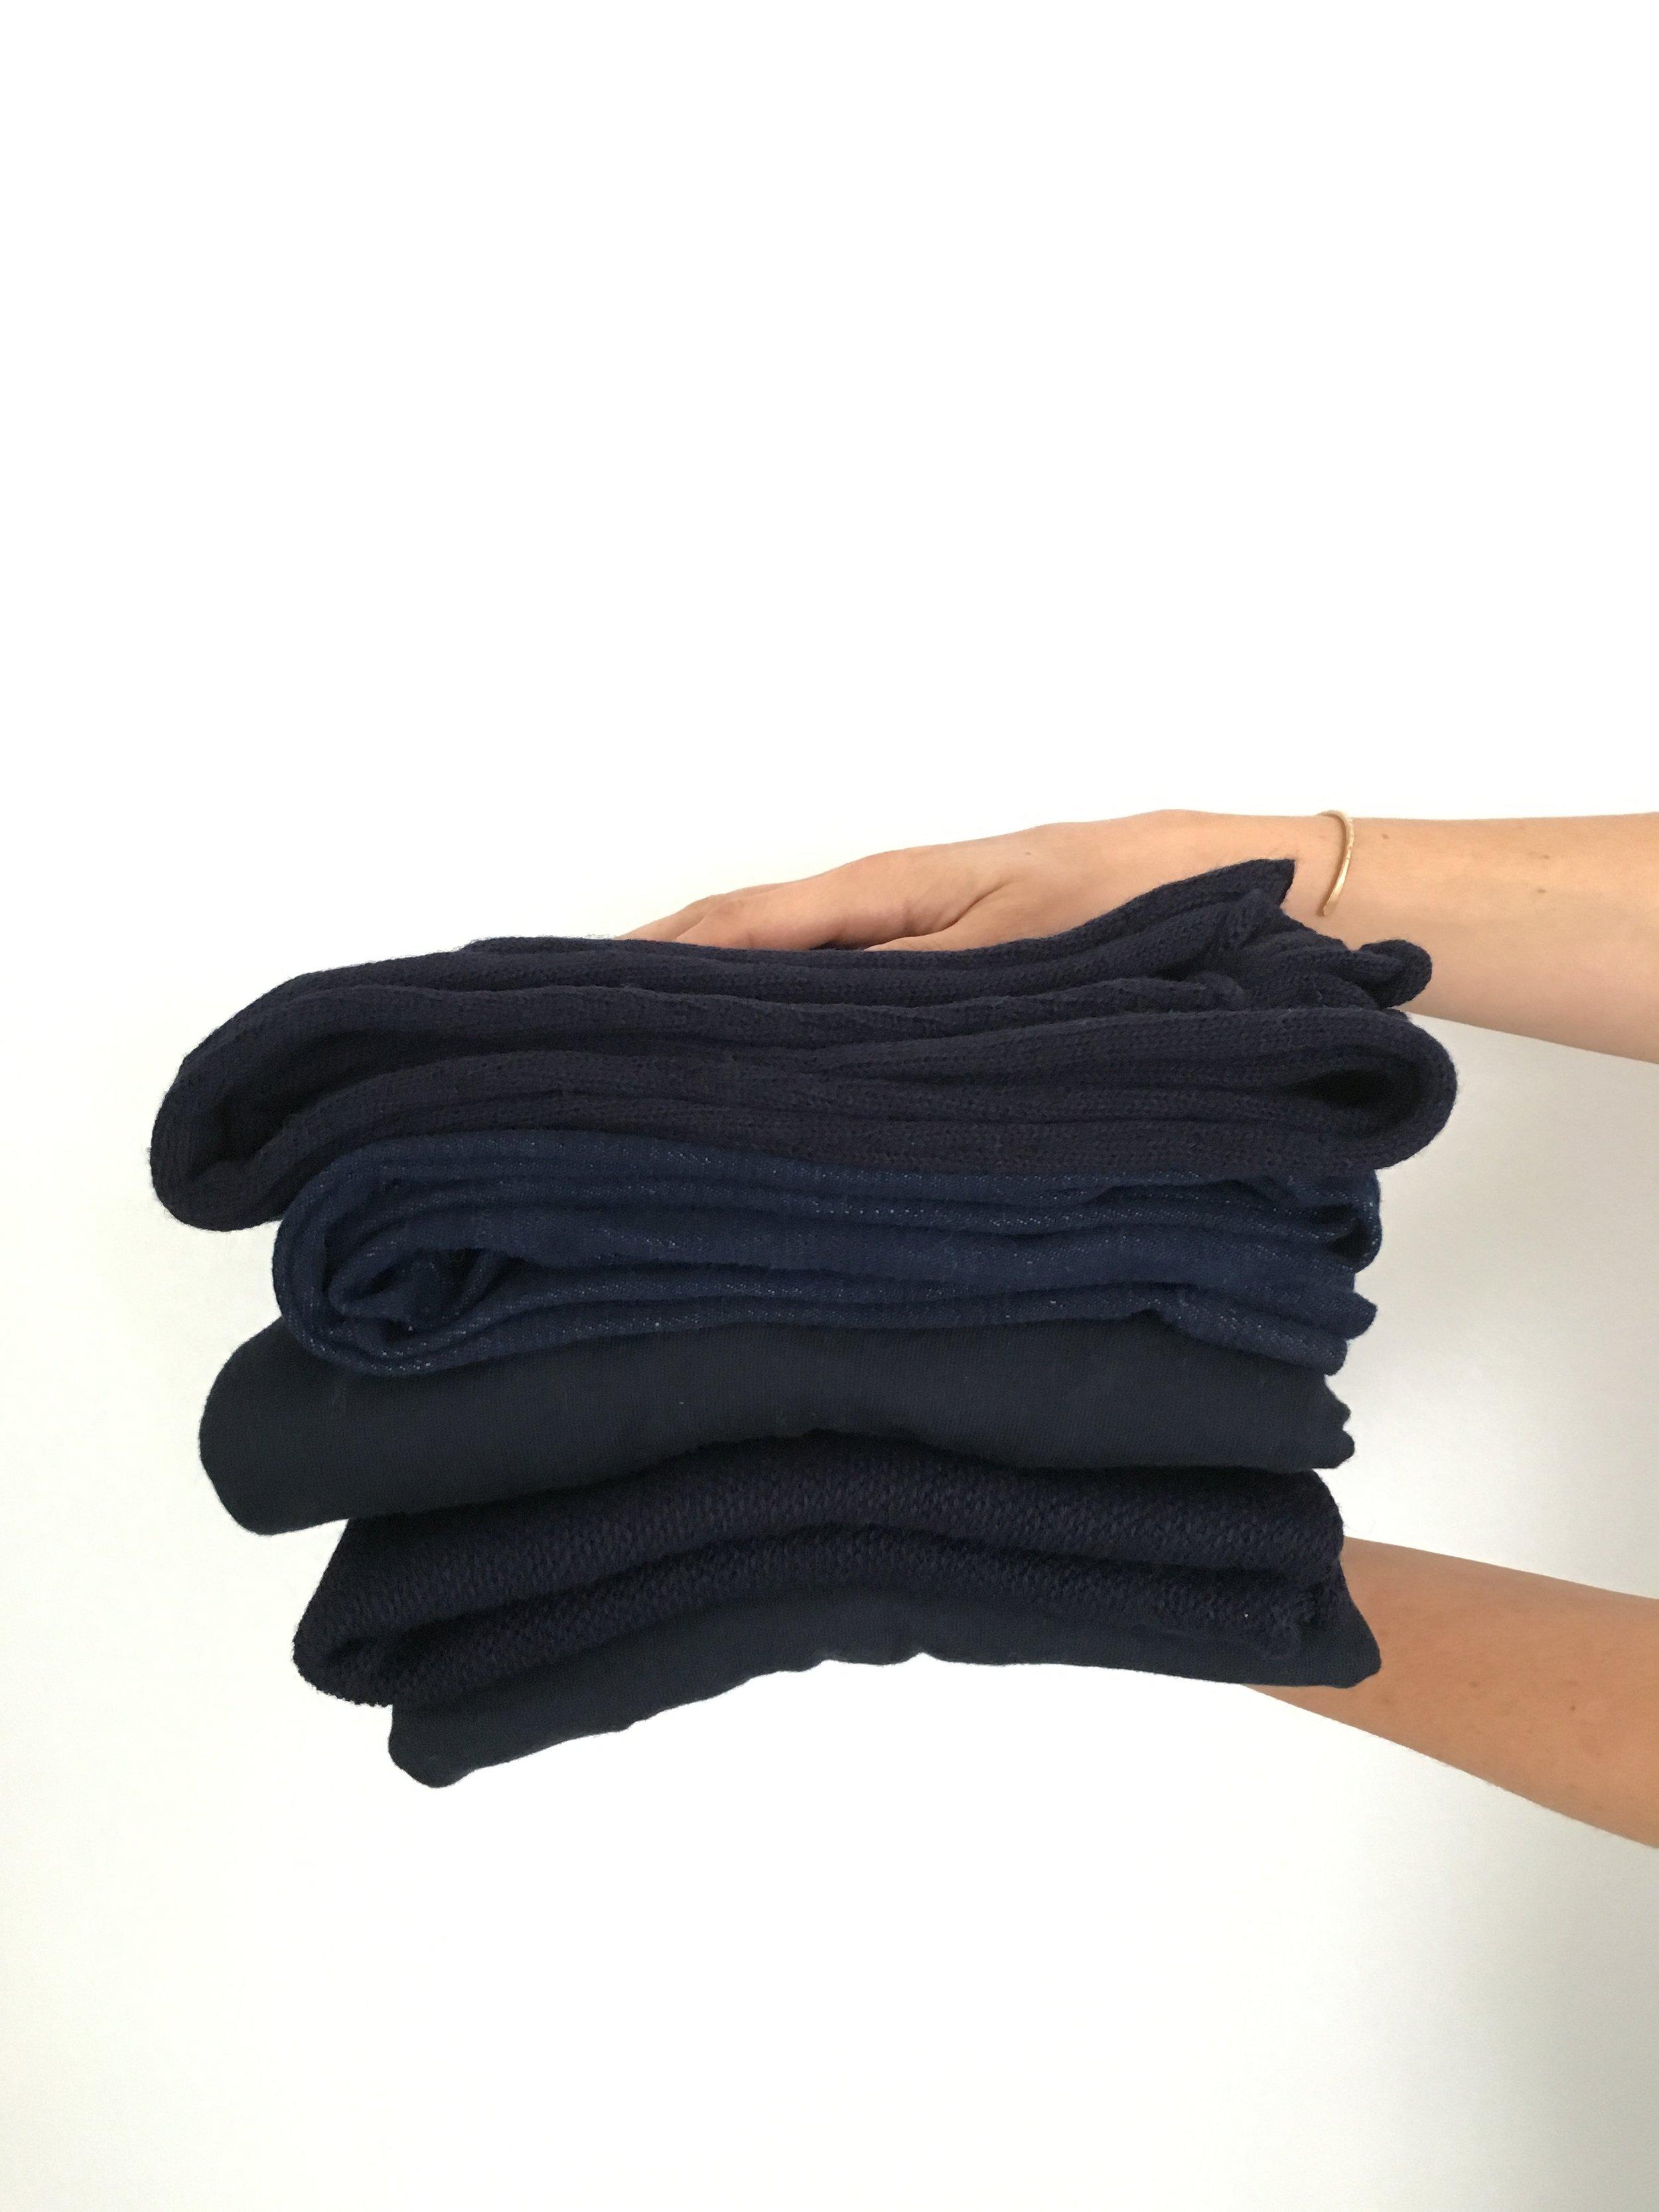 garmentory sale